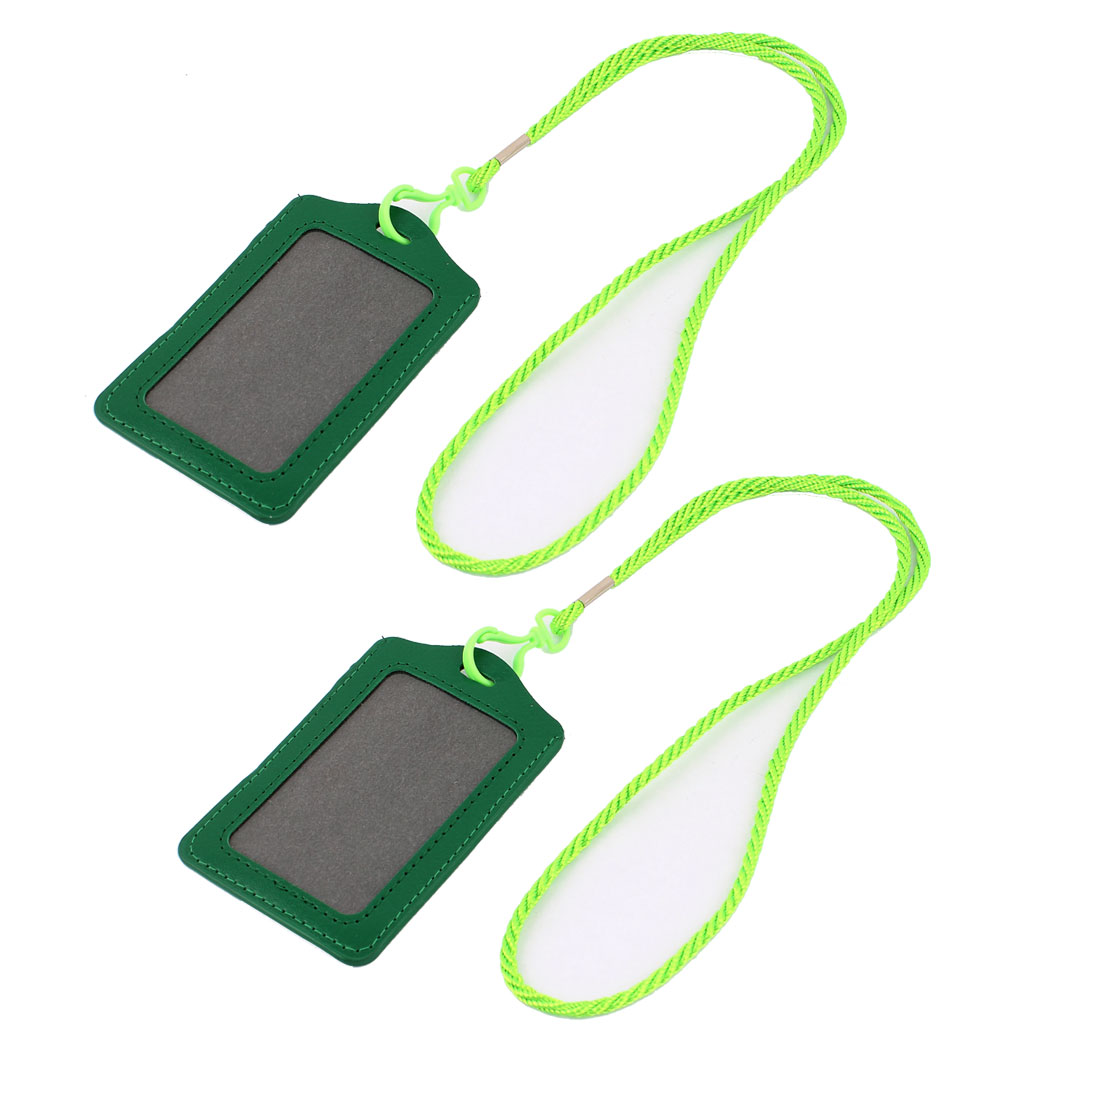 2pcs Green Vertical Name Tag ID Work Card Badge Holder w Neck Strap Lanyard